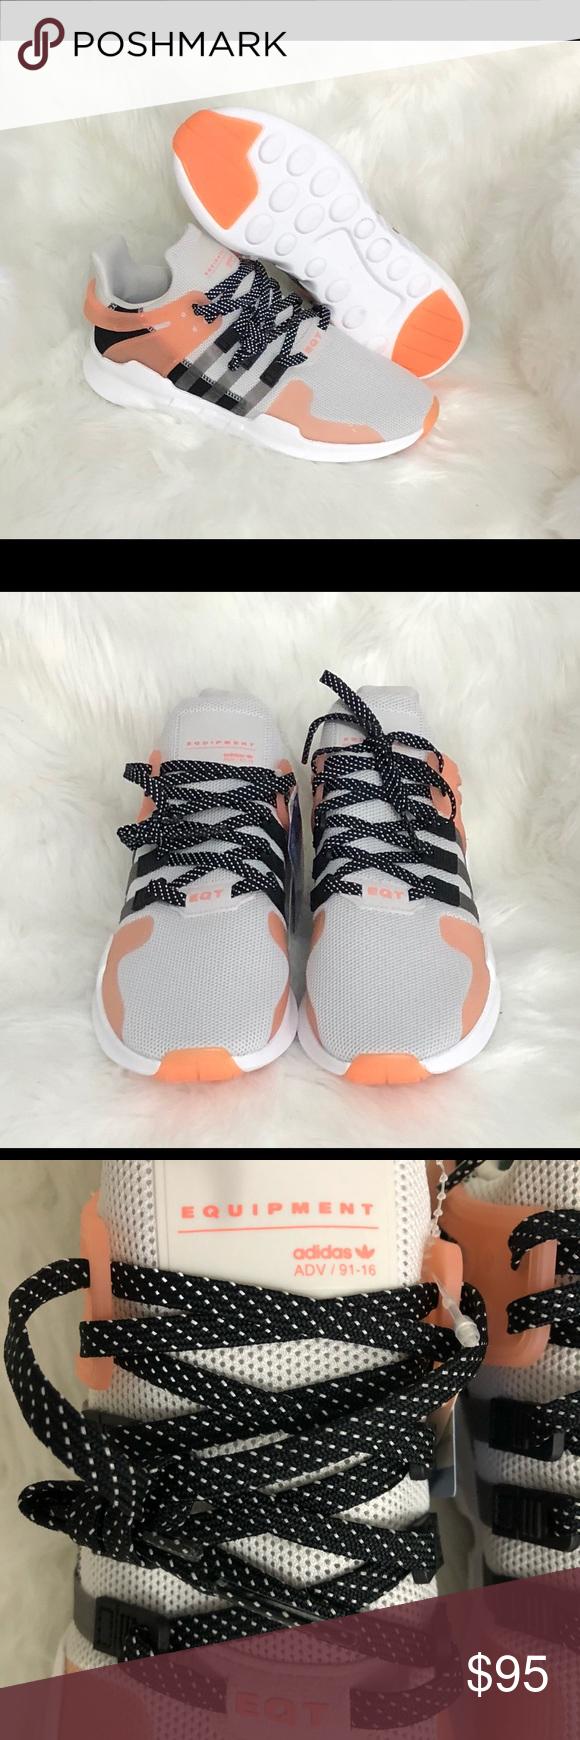 Adidas Originals Eqt Support Adv 8 Brand New Without Original Box Adidas Originals Eqt Support Adv Grey Shoes Sneakers Adidas Pink Adidas Adidas Originals